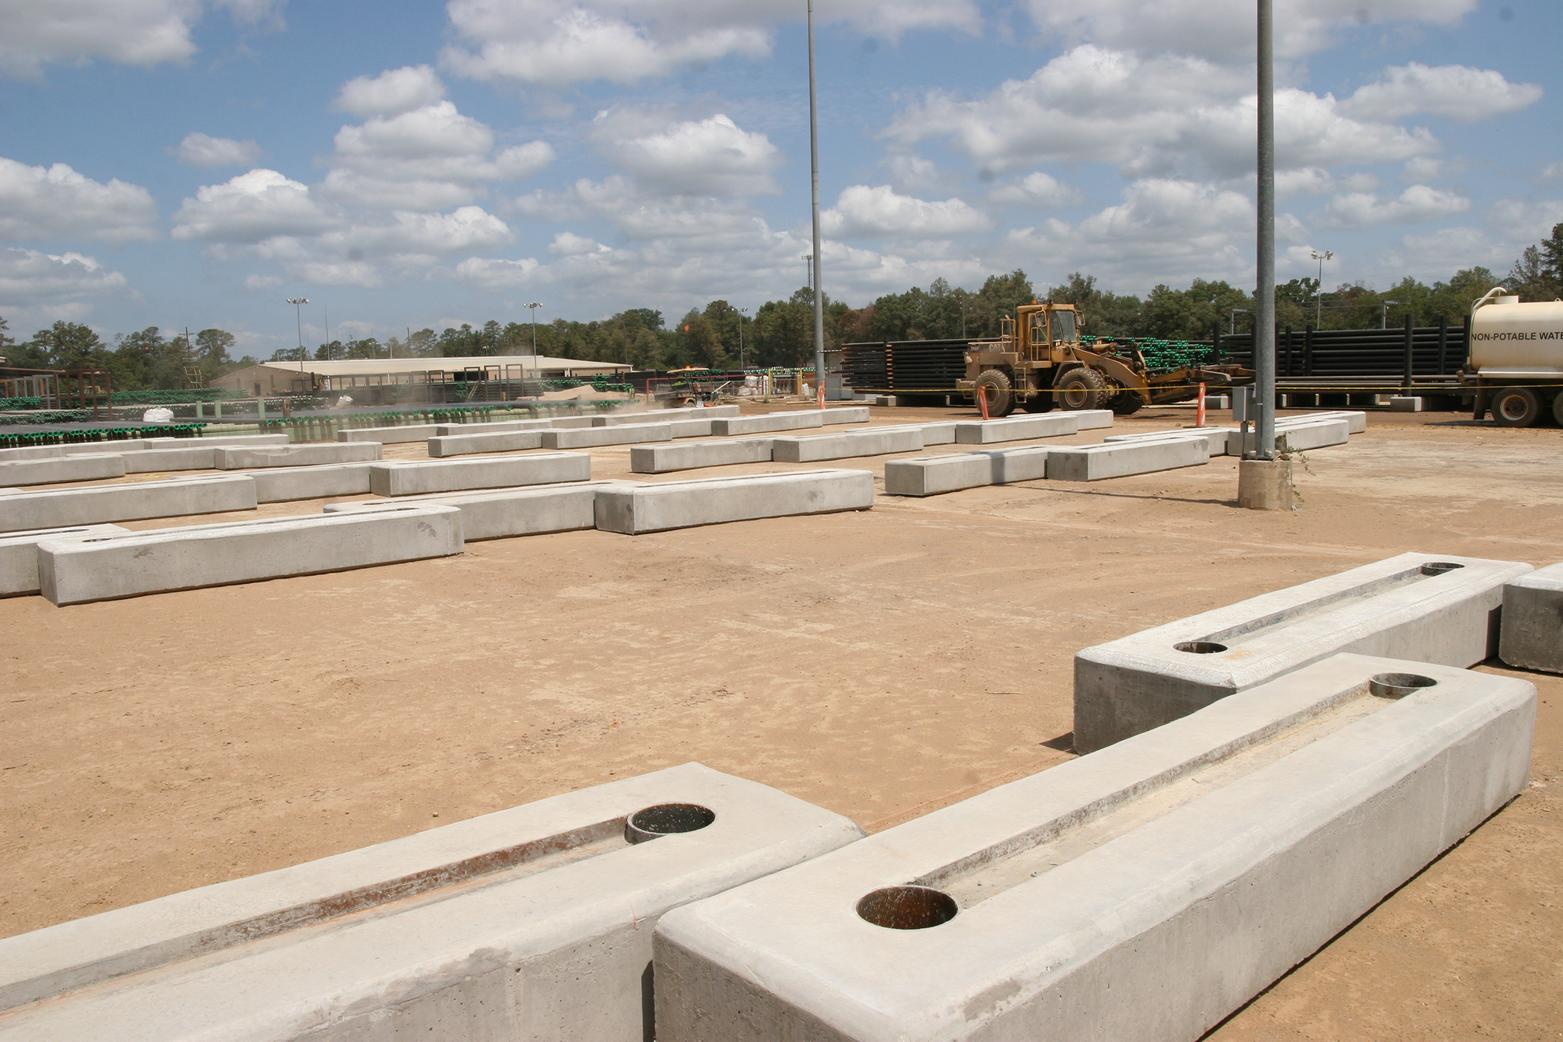 Concrete Pipe Rack Construction   Corestone Paving and Construction